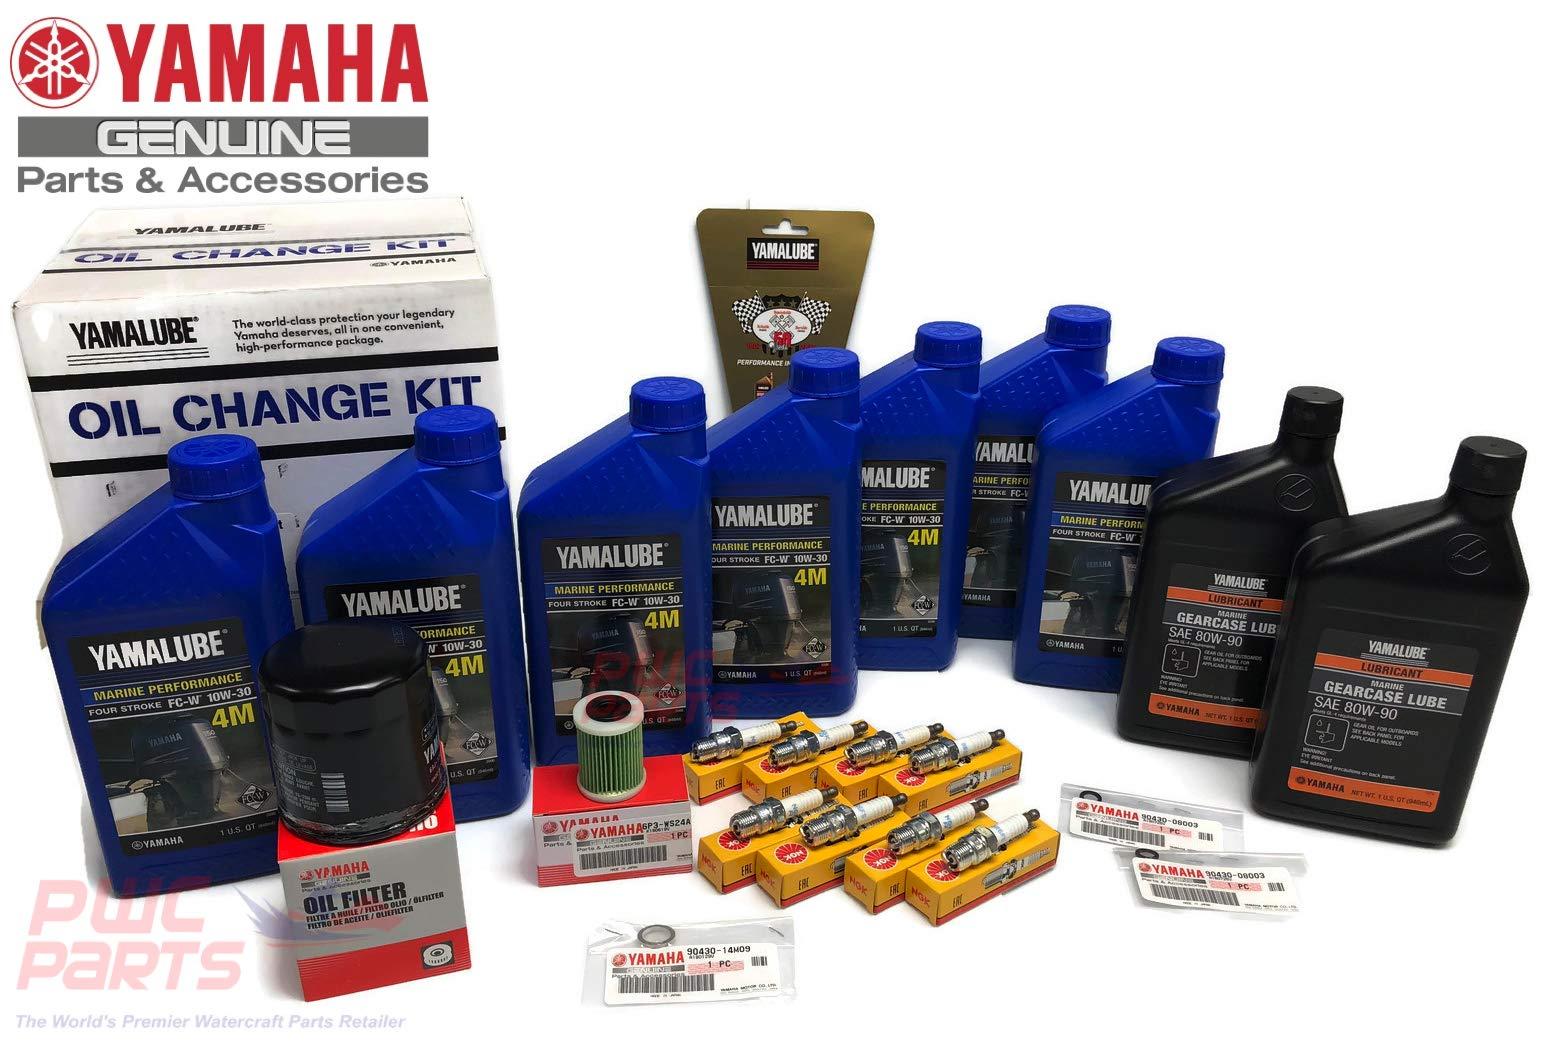 YAMAHA OEM F300 F350 V8 5.3L 2008+ Oil Change 10W30 FC 4M Lower Unit HD Gear Lube Drain Fill Gaskets NGK Spark Plugs LFR6A-11 Primary Fuel Filter Maintenance Kit